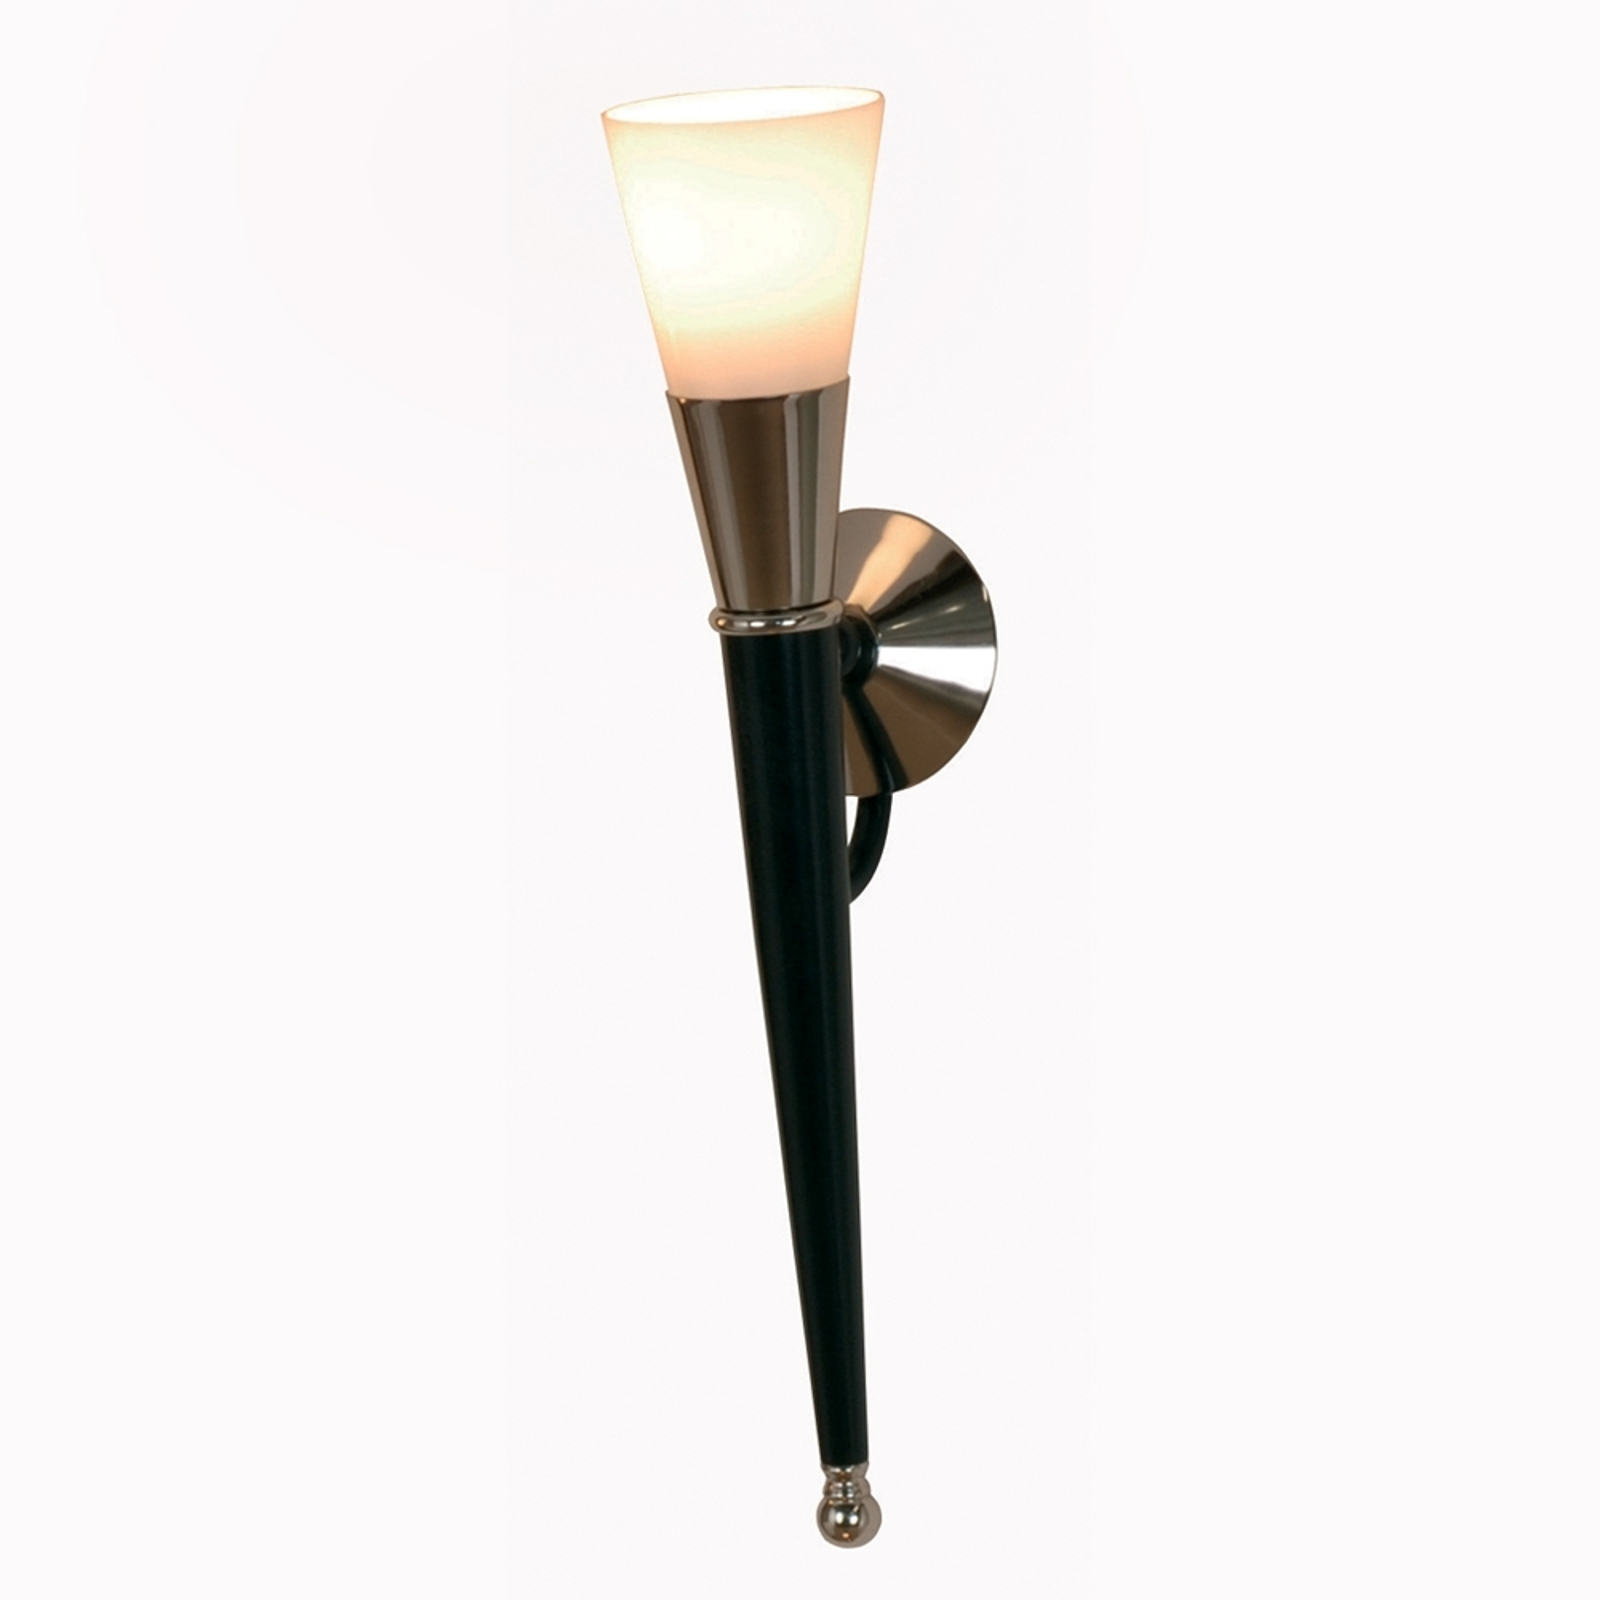 ANTOSA torch-shaped wall light 60cm high_6528010_1